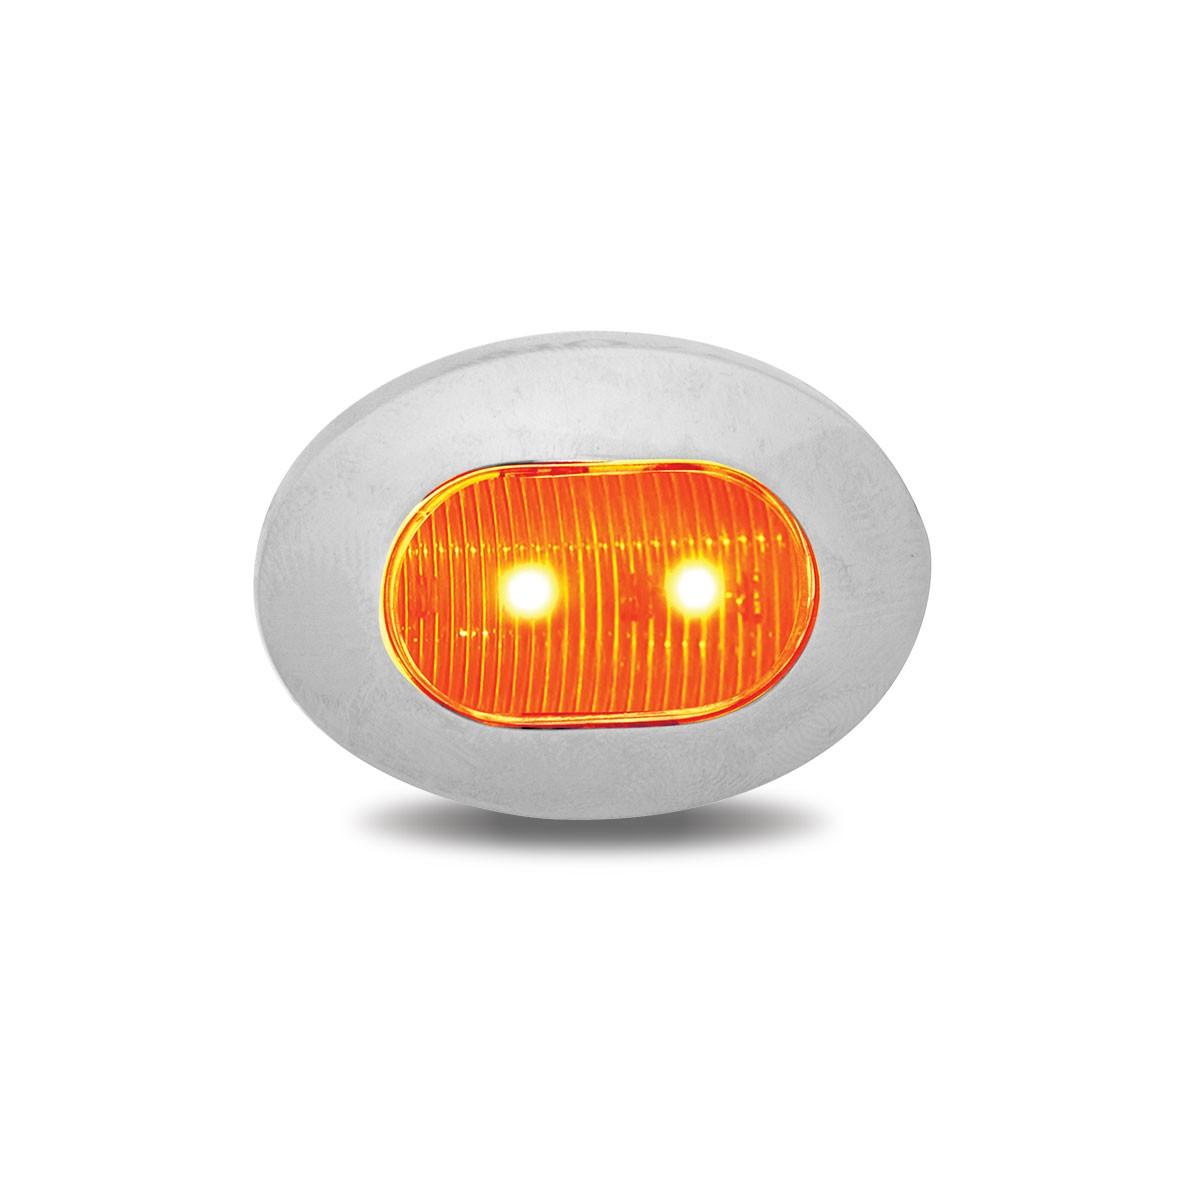 "Western Star 4900 >> 3/4"" Oval Amber LED Marker Light (2 Diodes)"